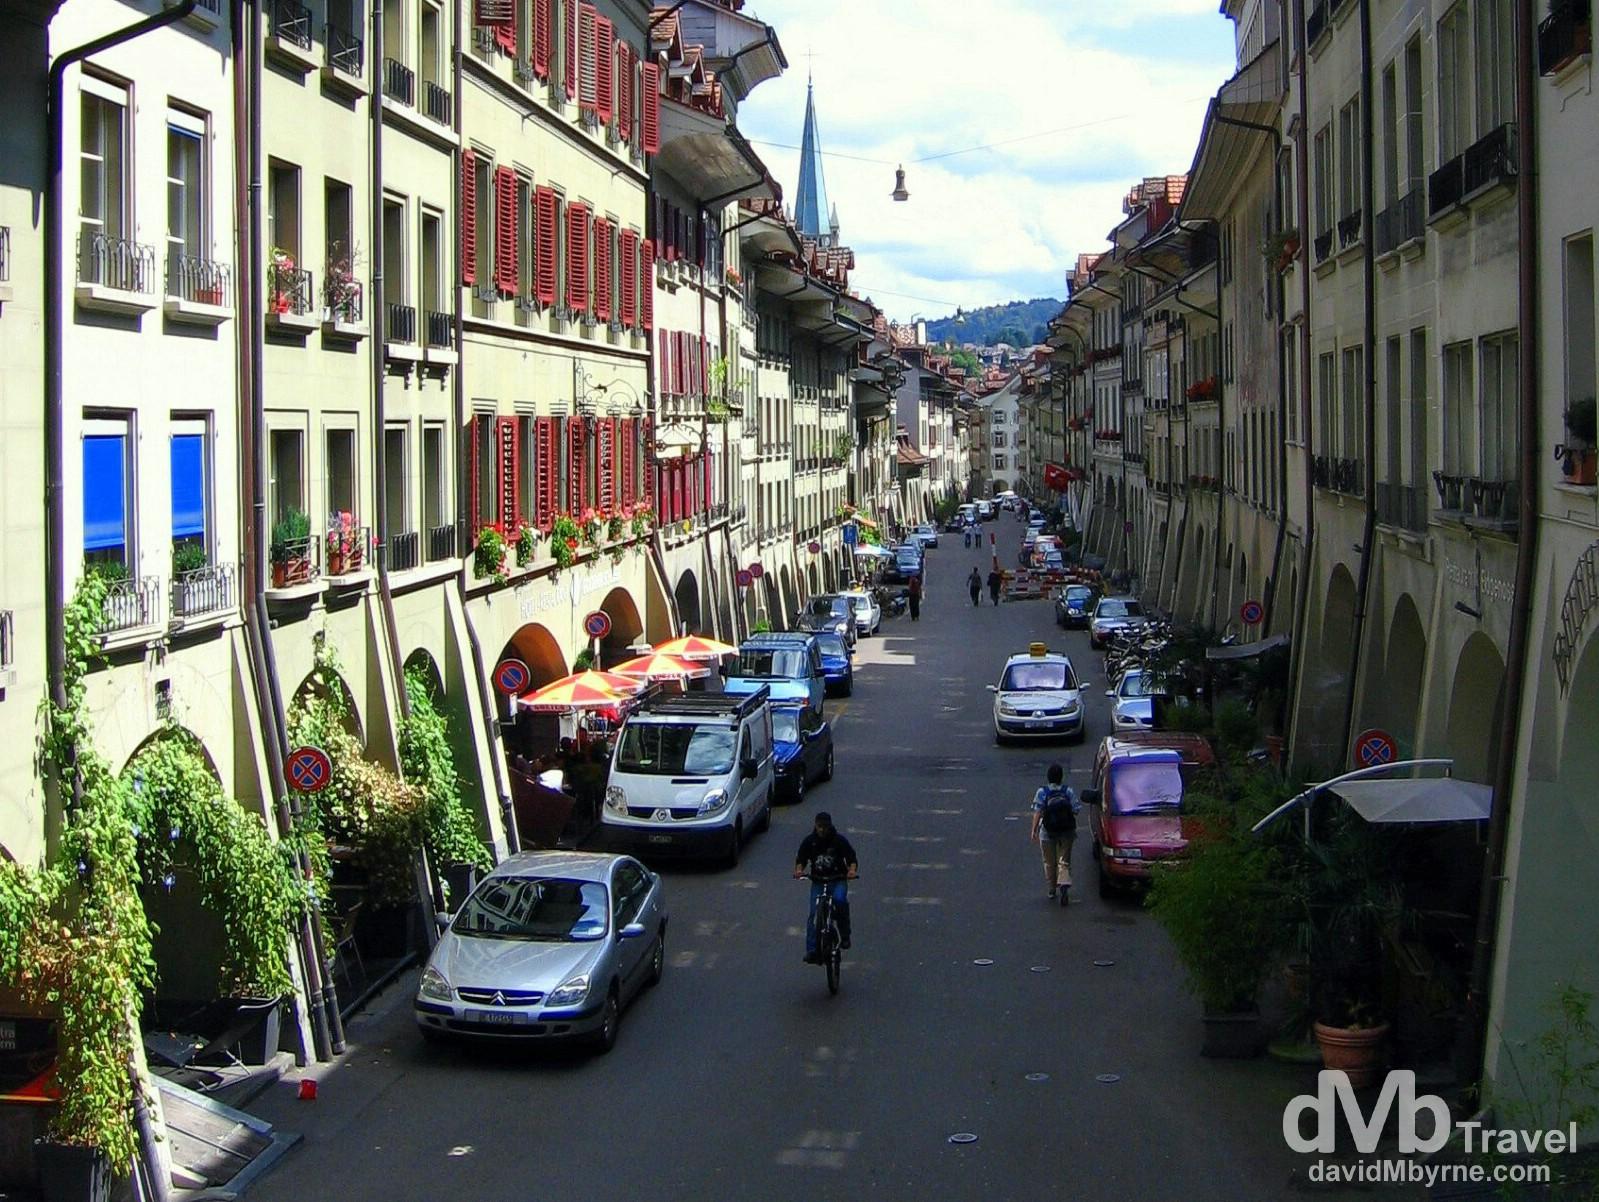 A street in Old Town Bern, Switzerland. August 23rd, 2007.